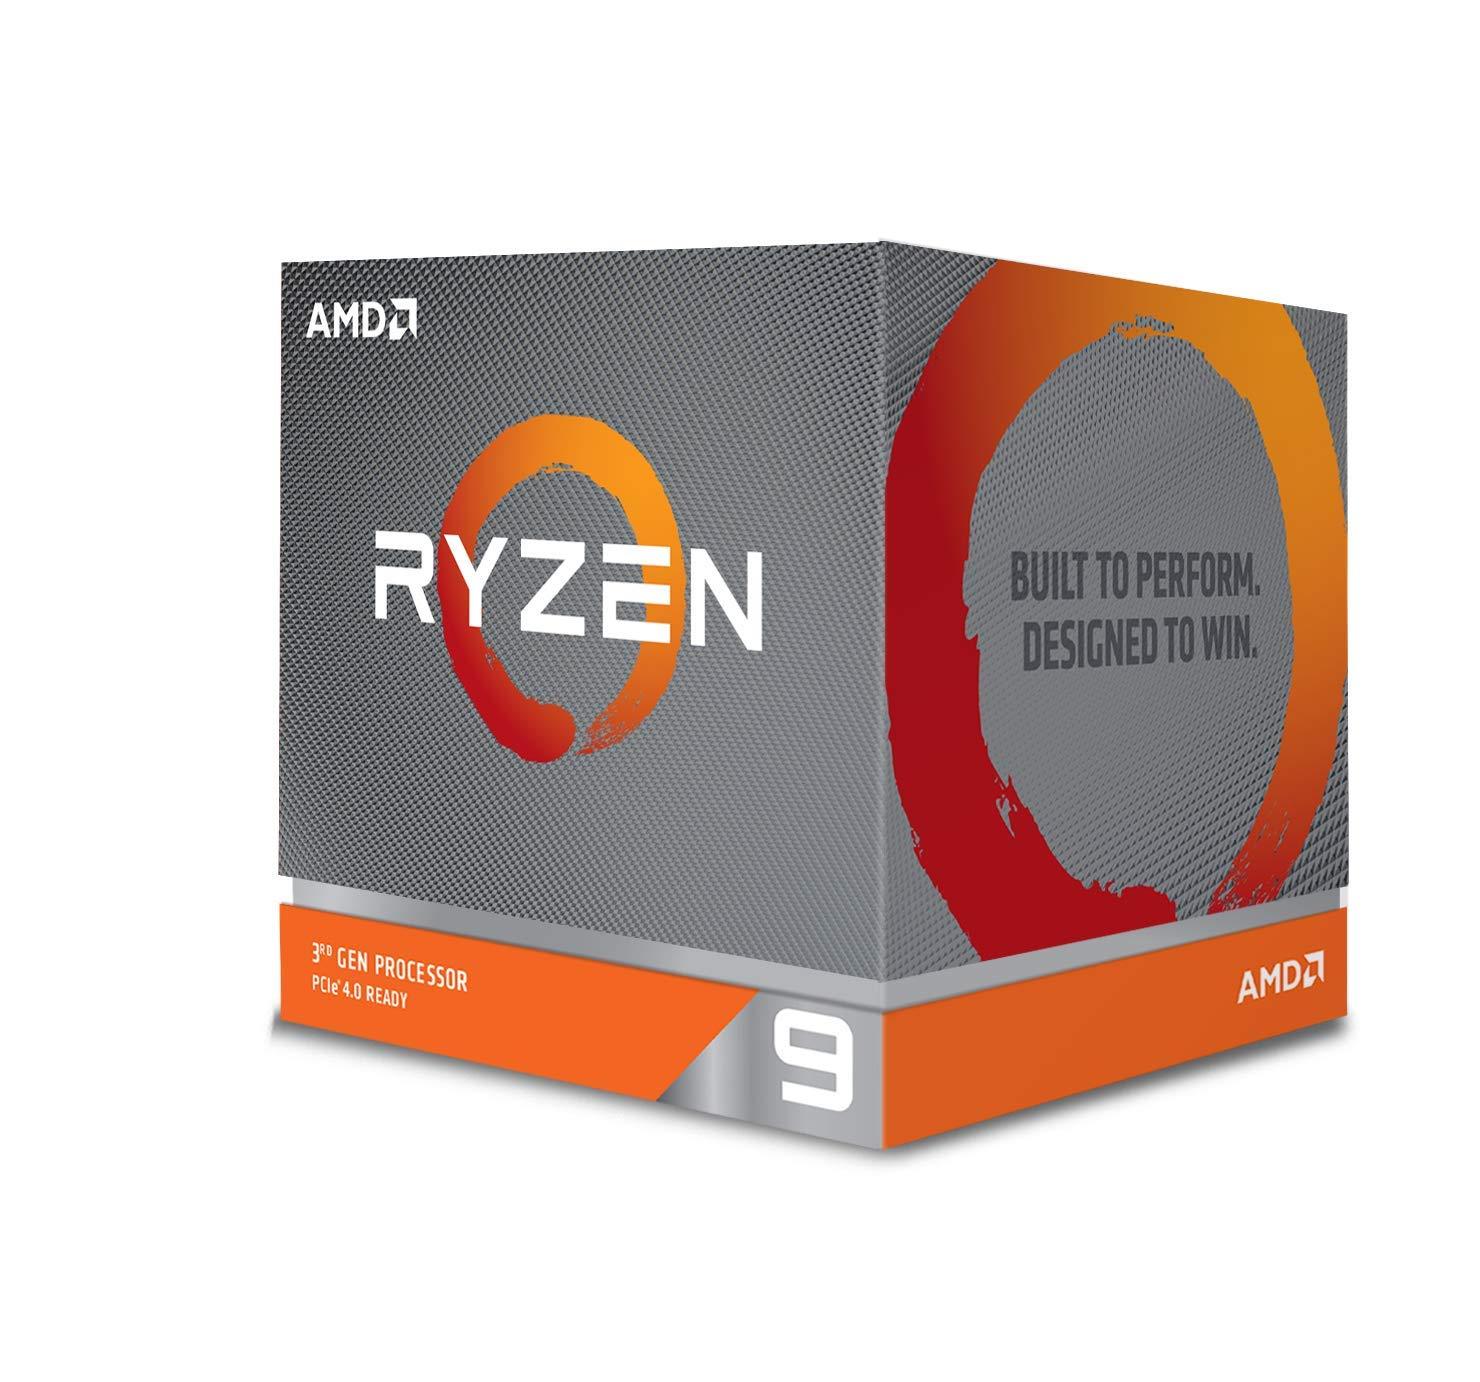 CPU Alternative - Best $1500 Gaming PC Build 2019